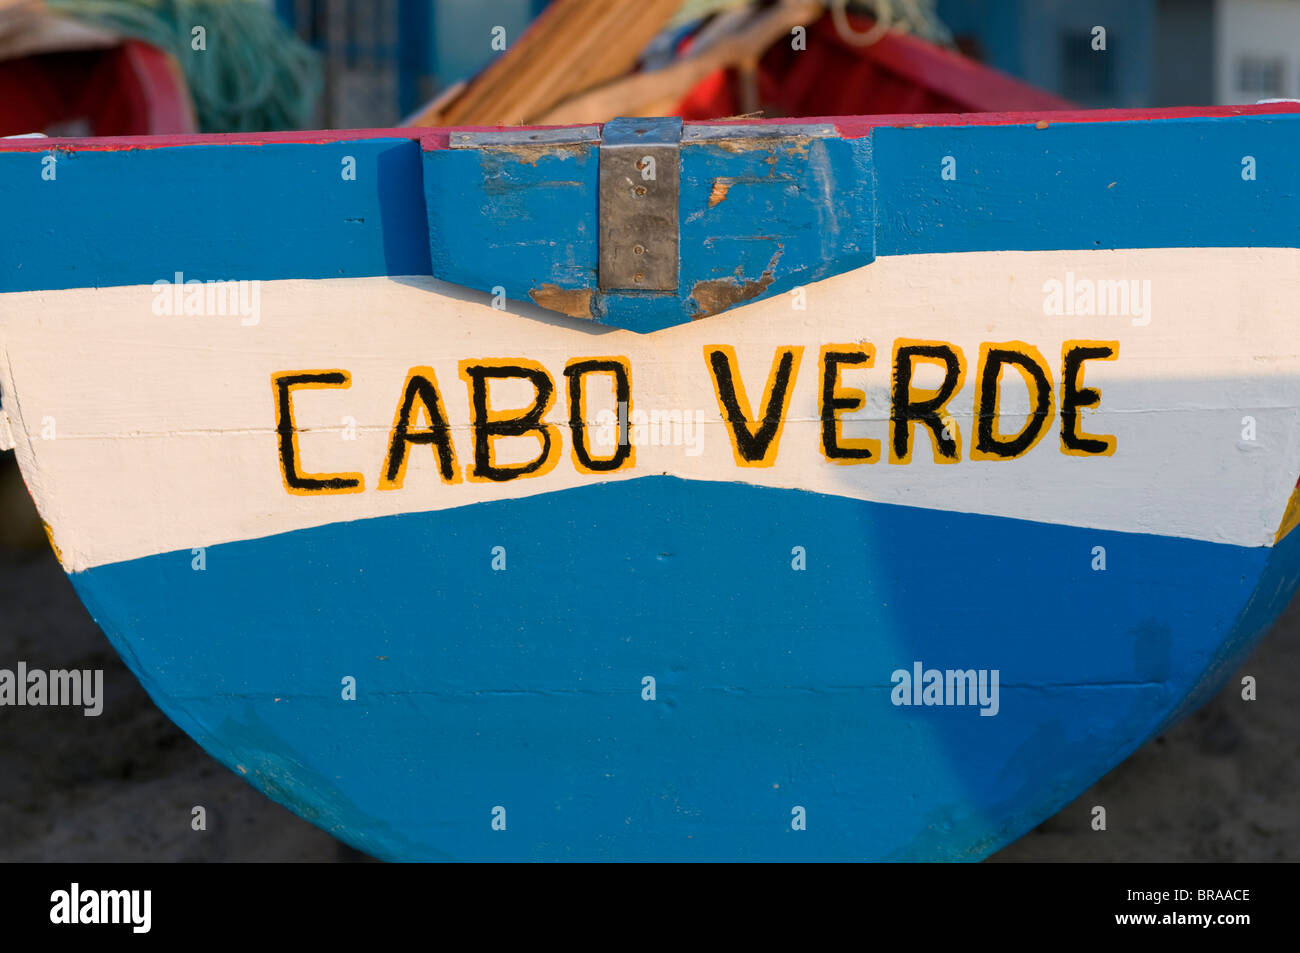 Barco de pesca con Cabo Verde nombre, Tarrafal, Santiago, Islas de Cabo Verde, África Imagen De Stock